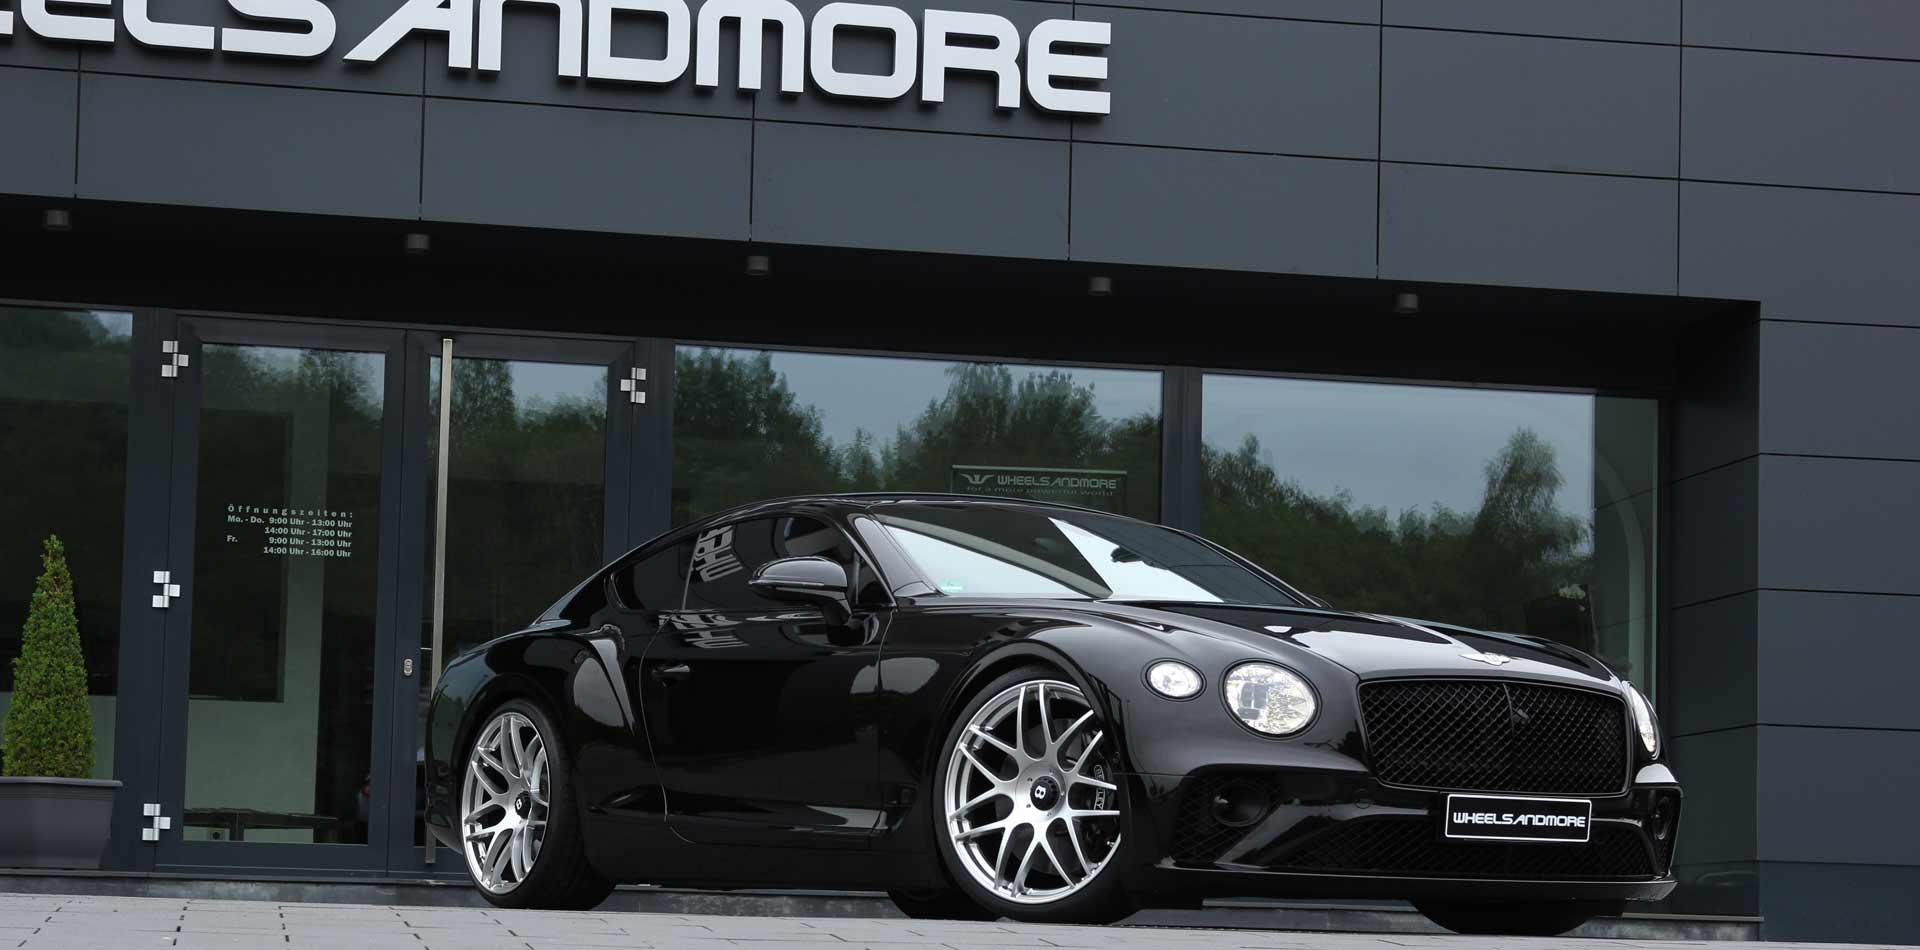 22 zoll felgen in silber an schwarzem Bentley